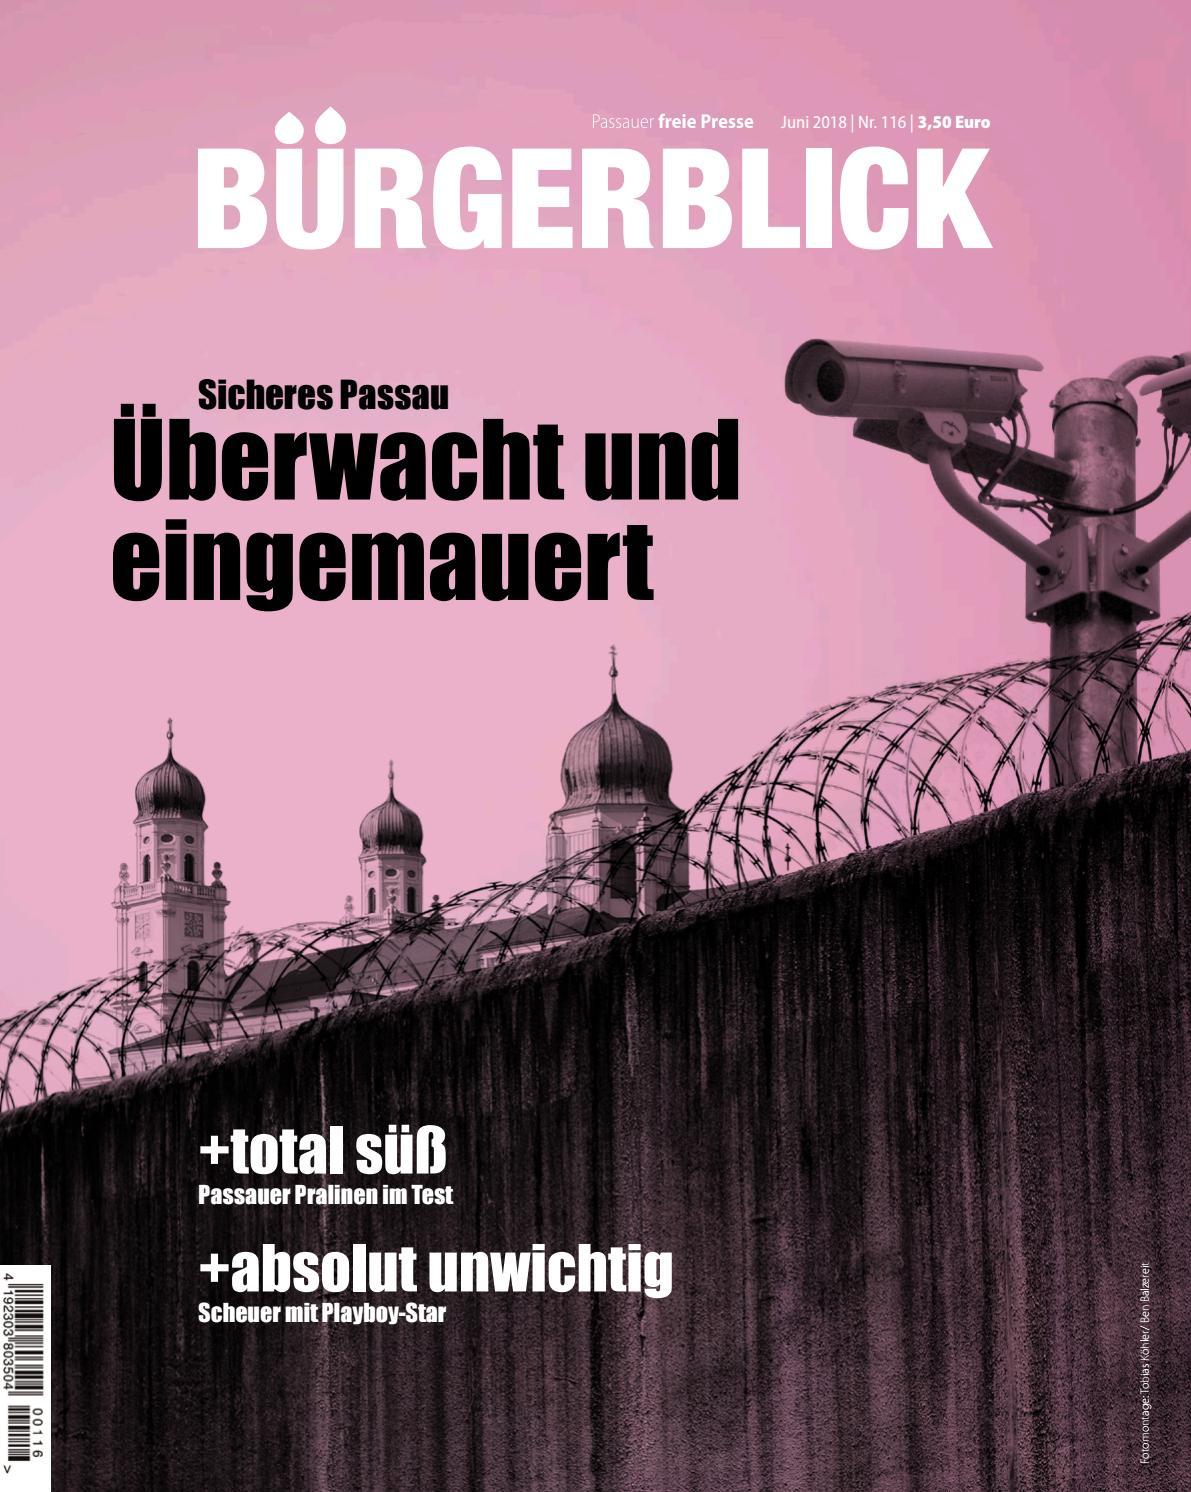 Burgerblick Nr 116 By Hubert Jakob Denk Issuu